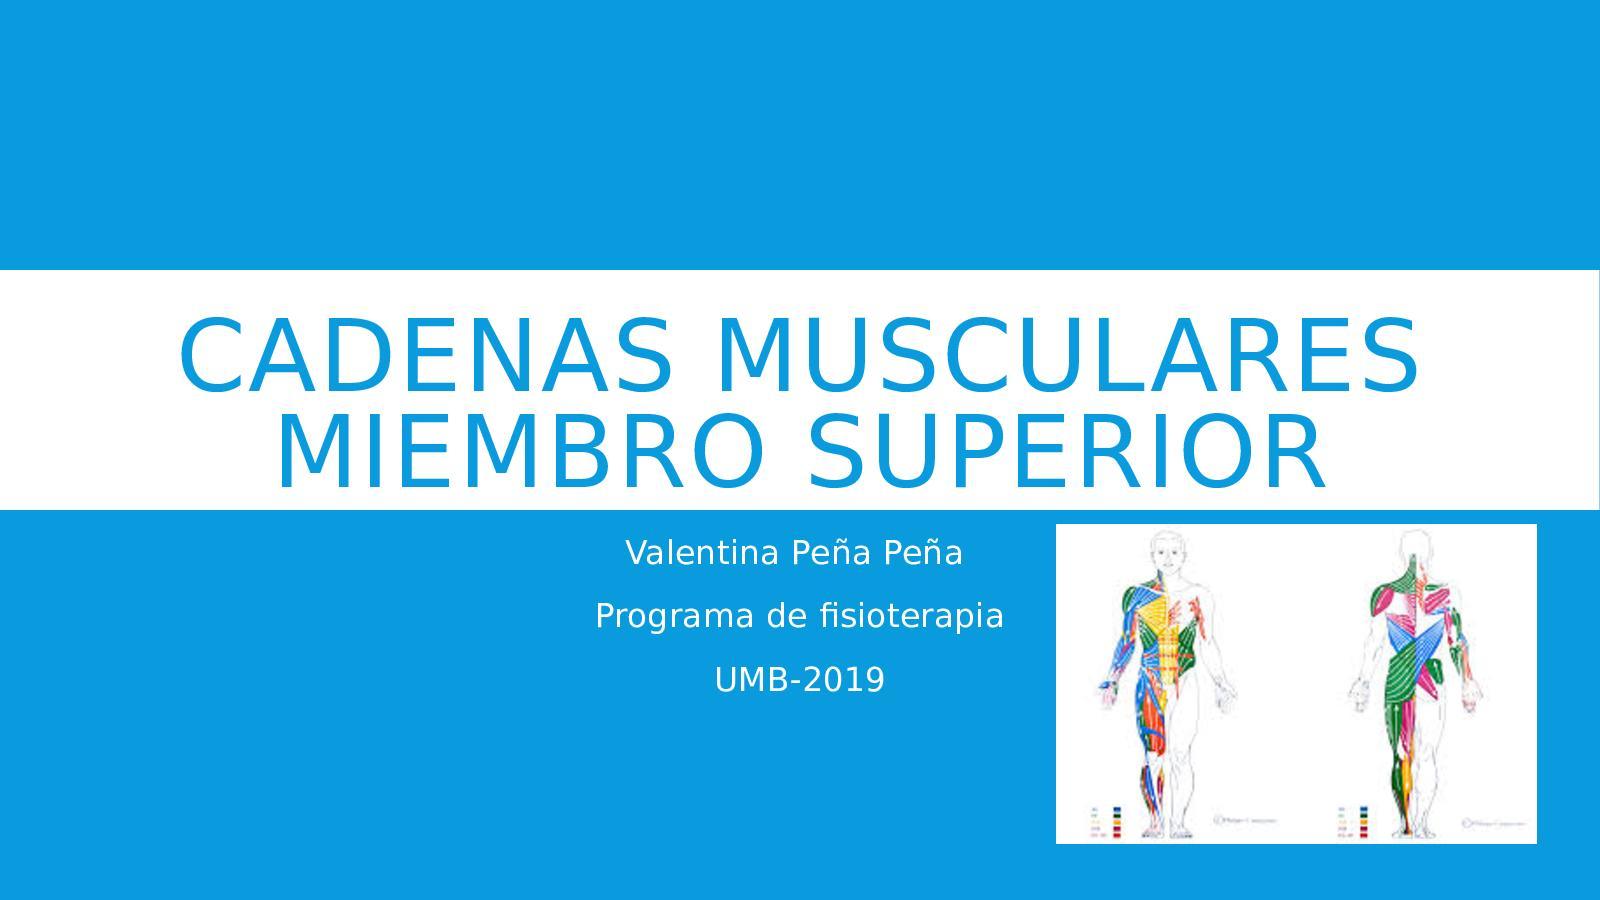 Busquet cadenas pdf musculares